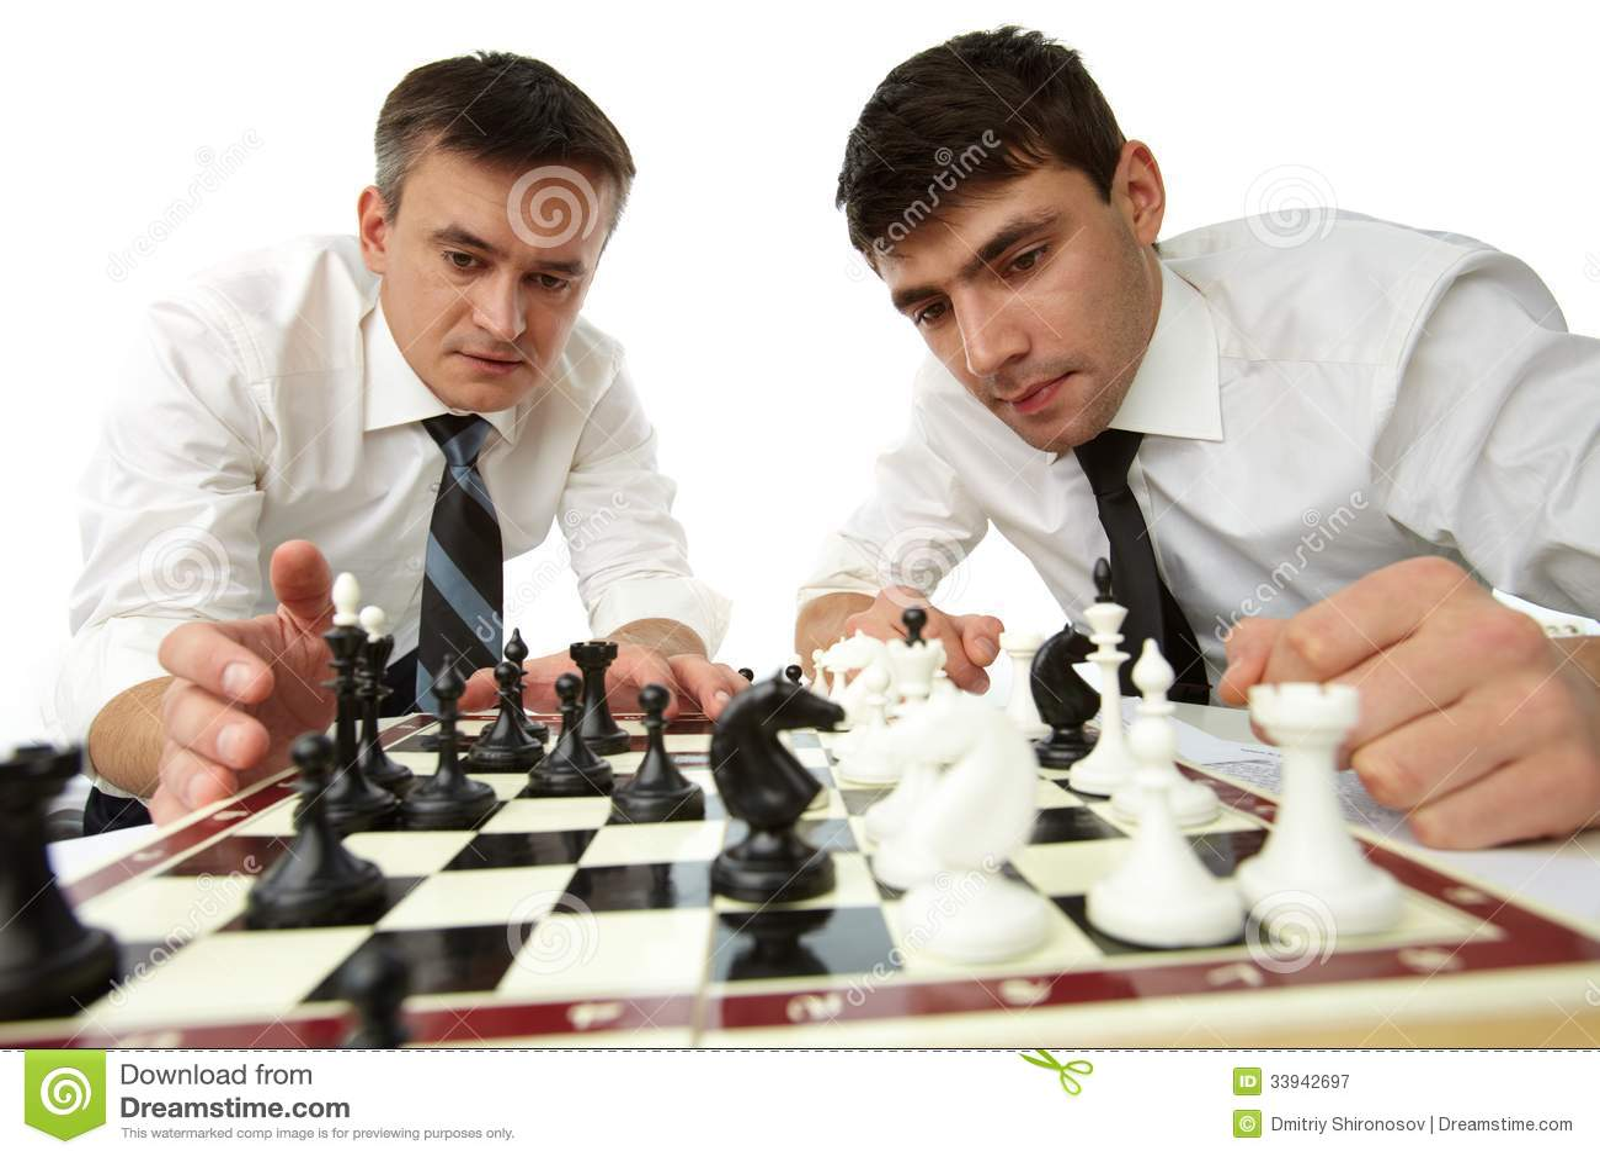 Strategic thinking